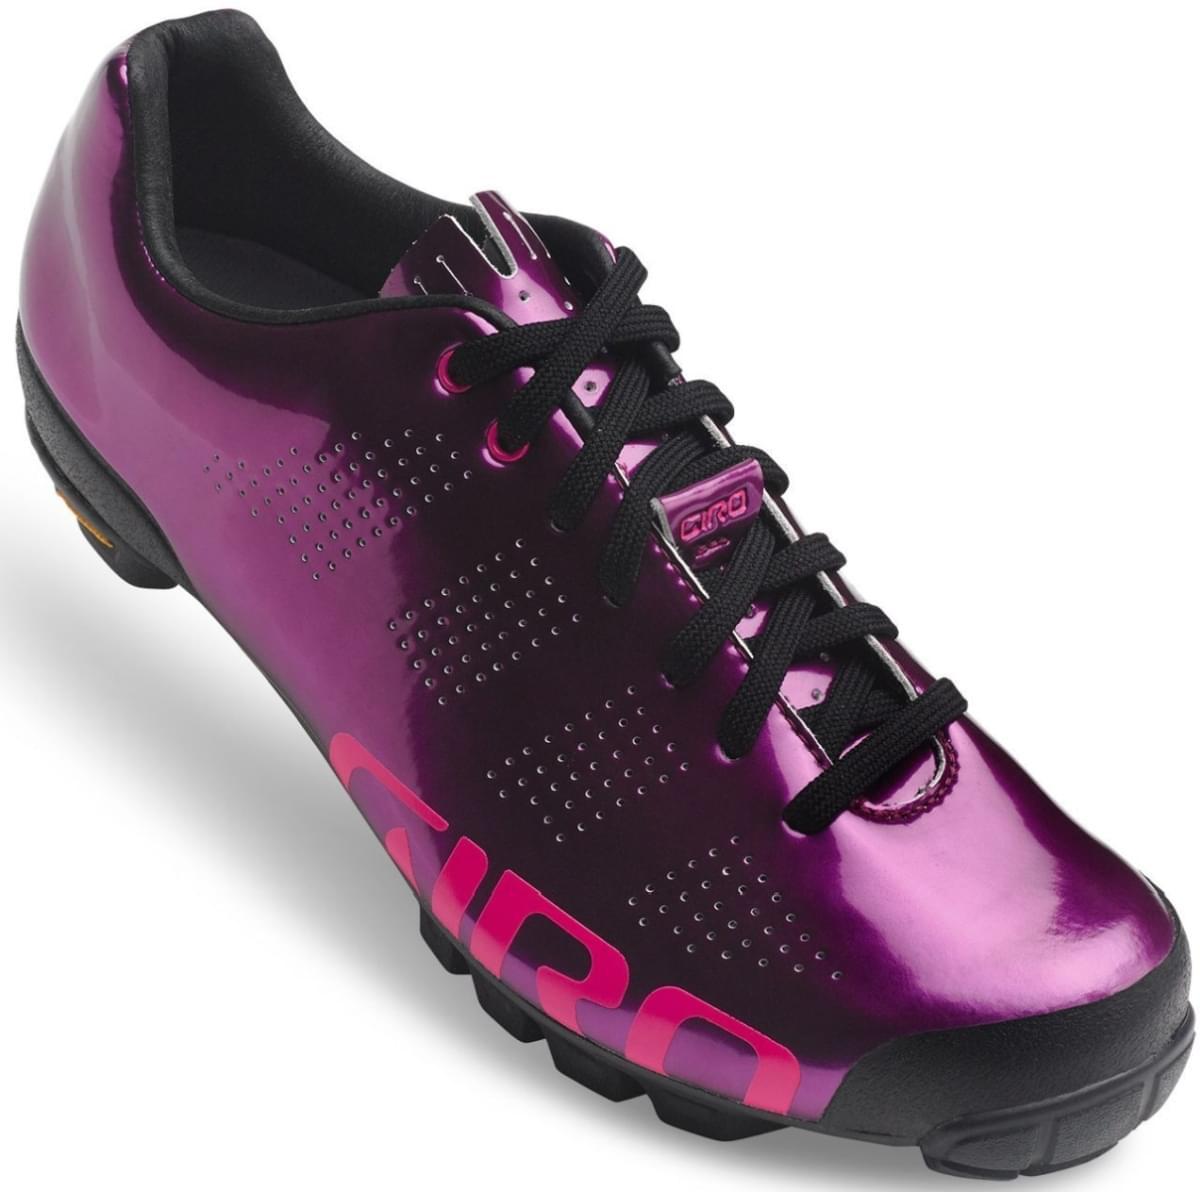 Giro Empire W Vr90 Berry/Bright Pink 38